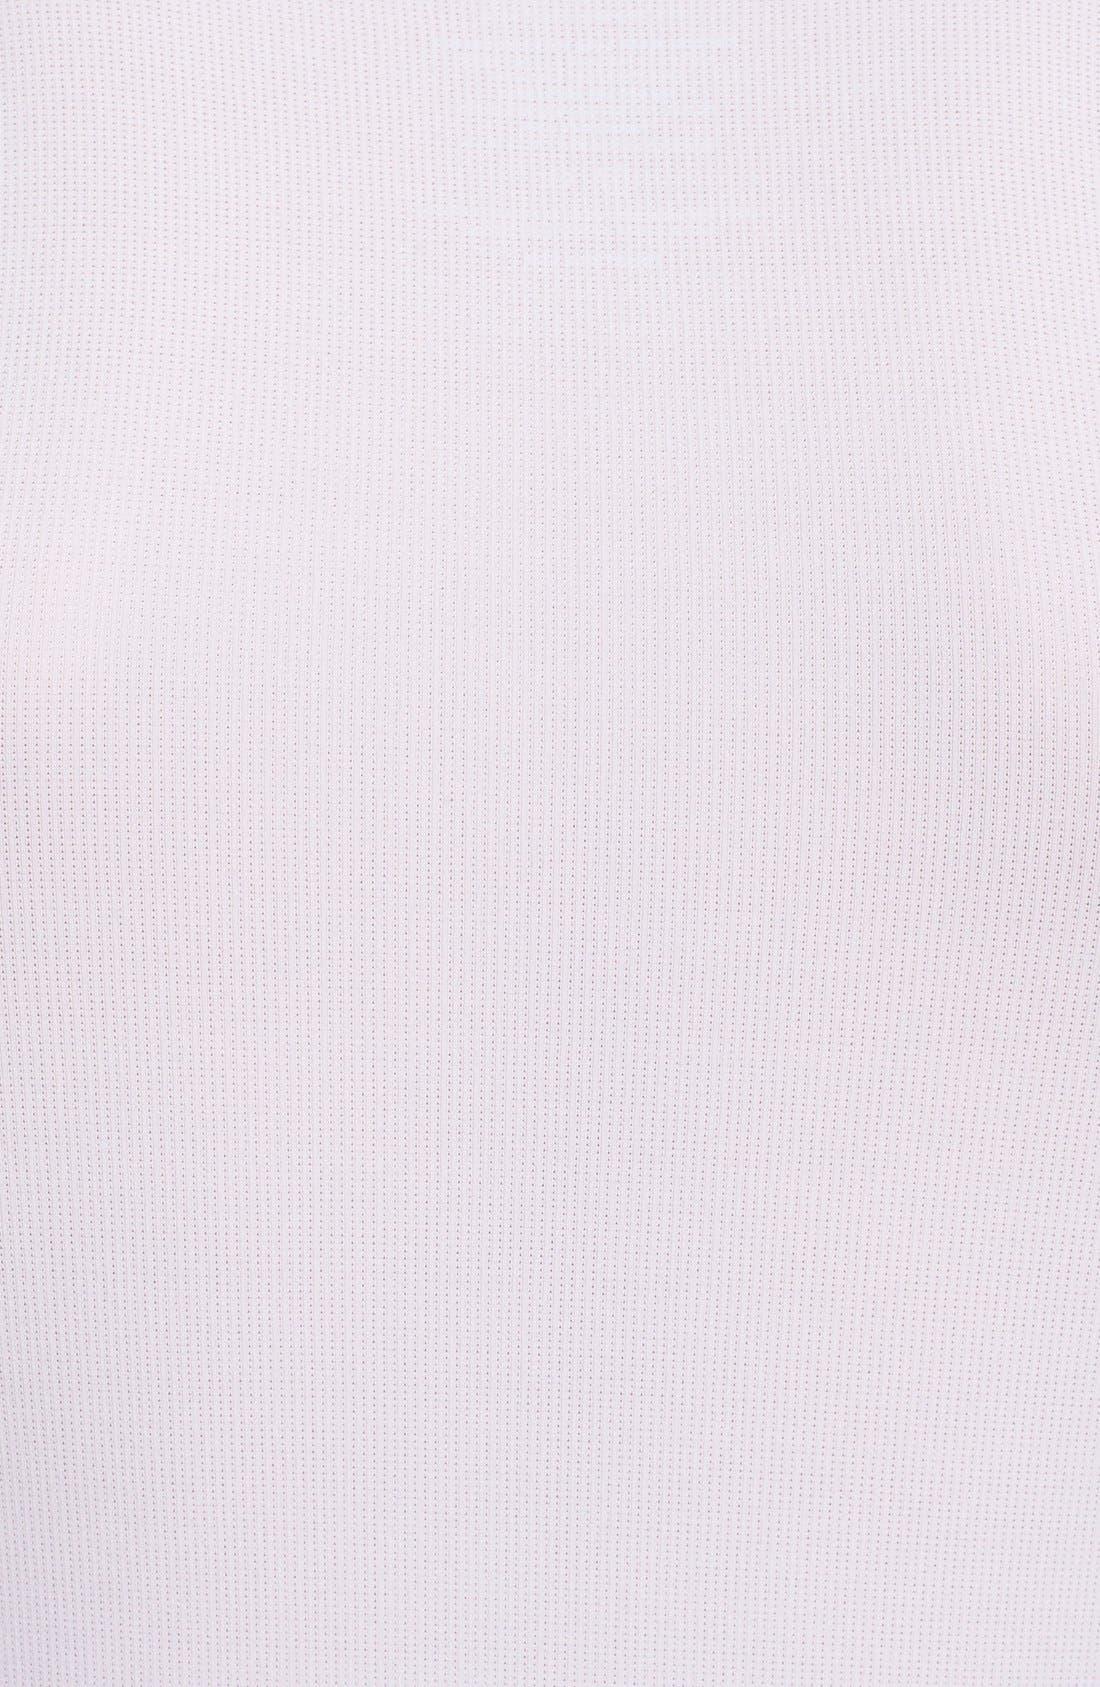 Alternate Image 3  - Tommy John 'Air' Tank Undershirt